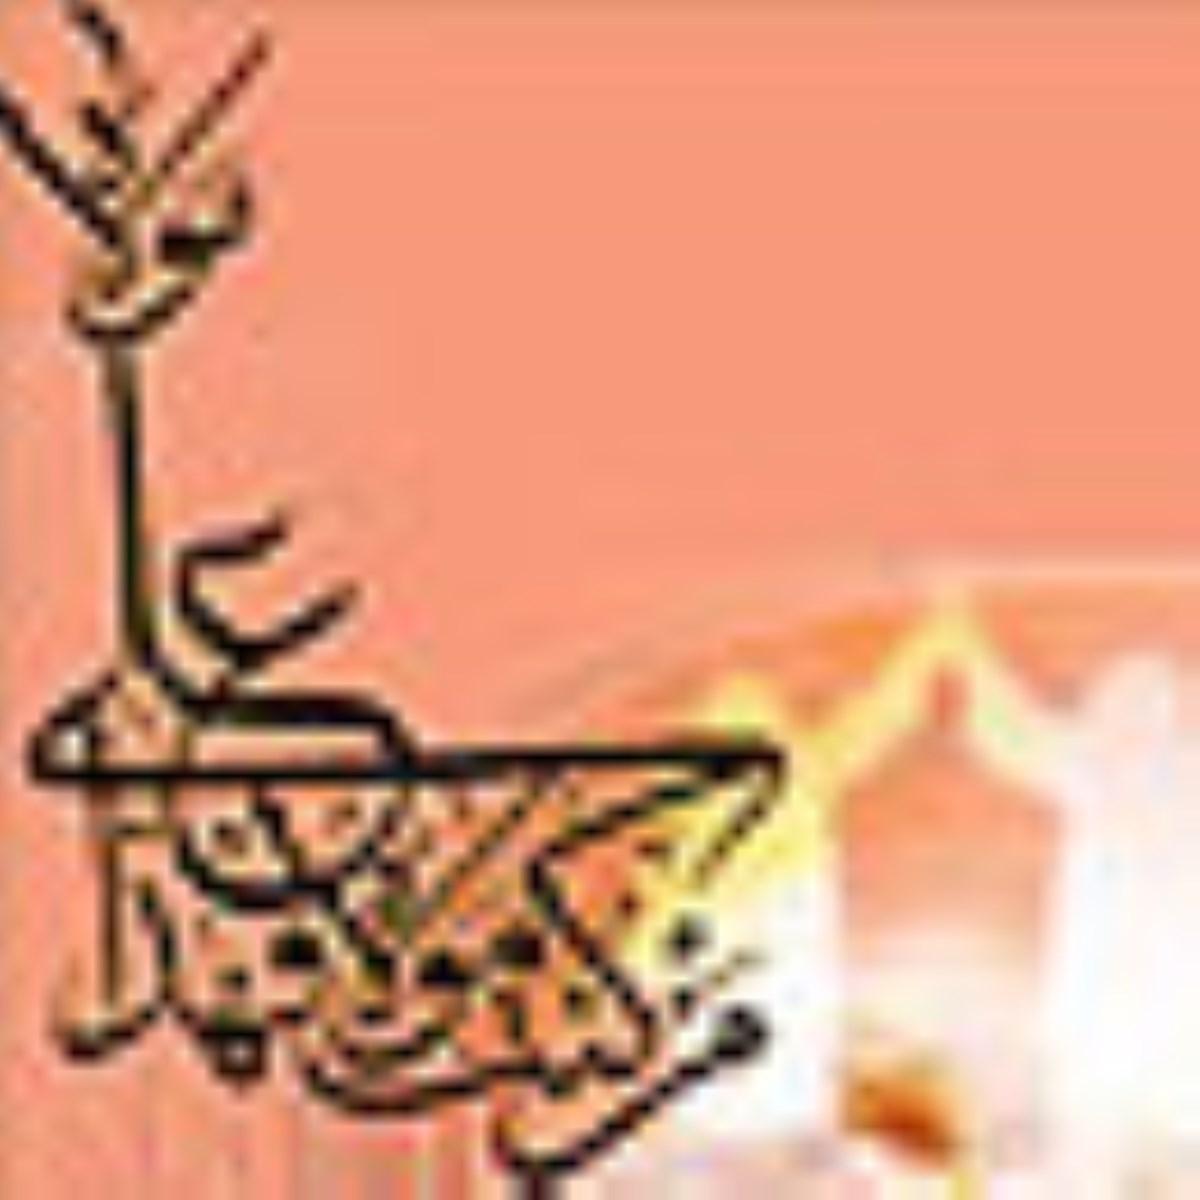 تبيين نظام سياسي اسلام در غدير خم